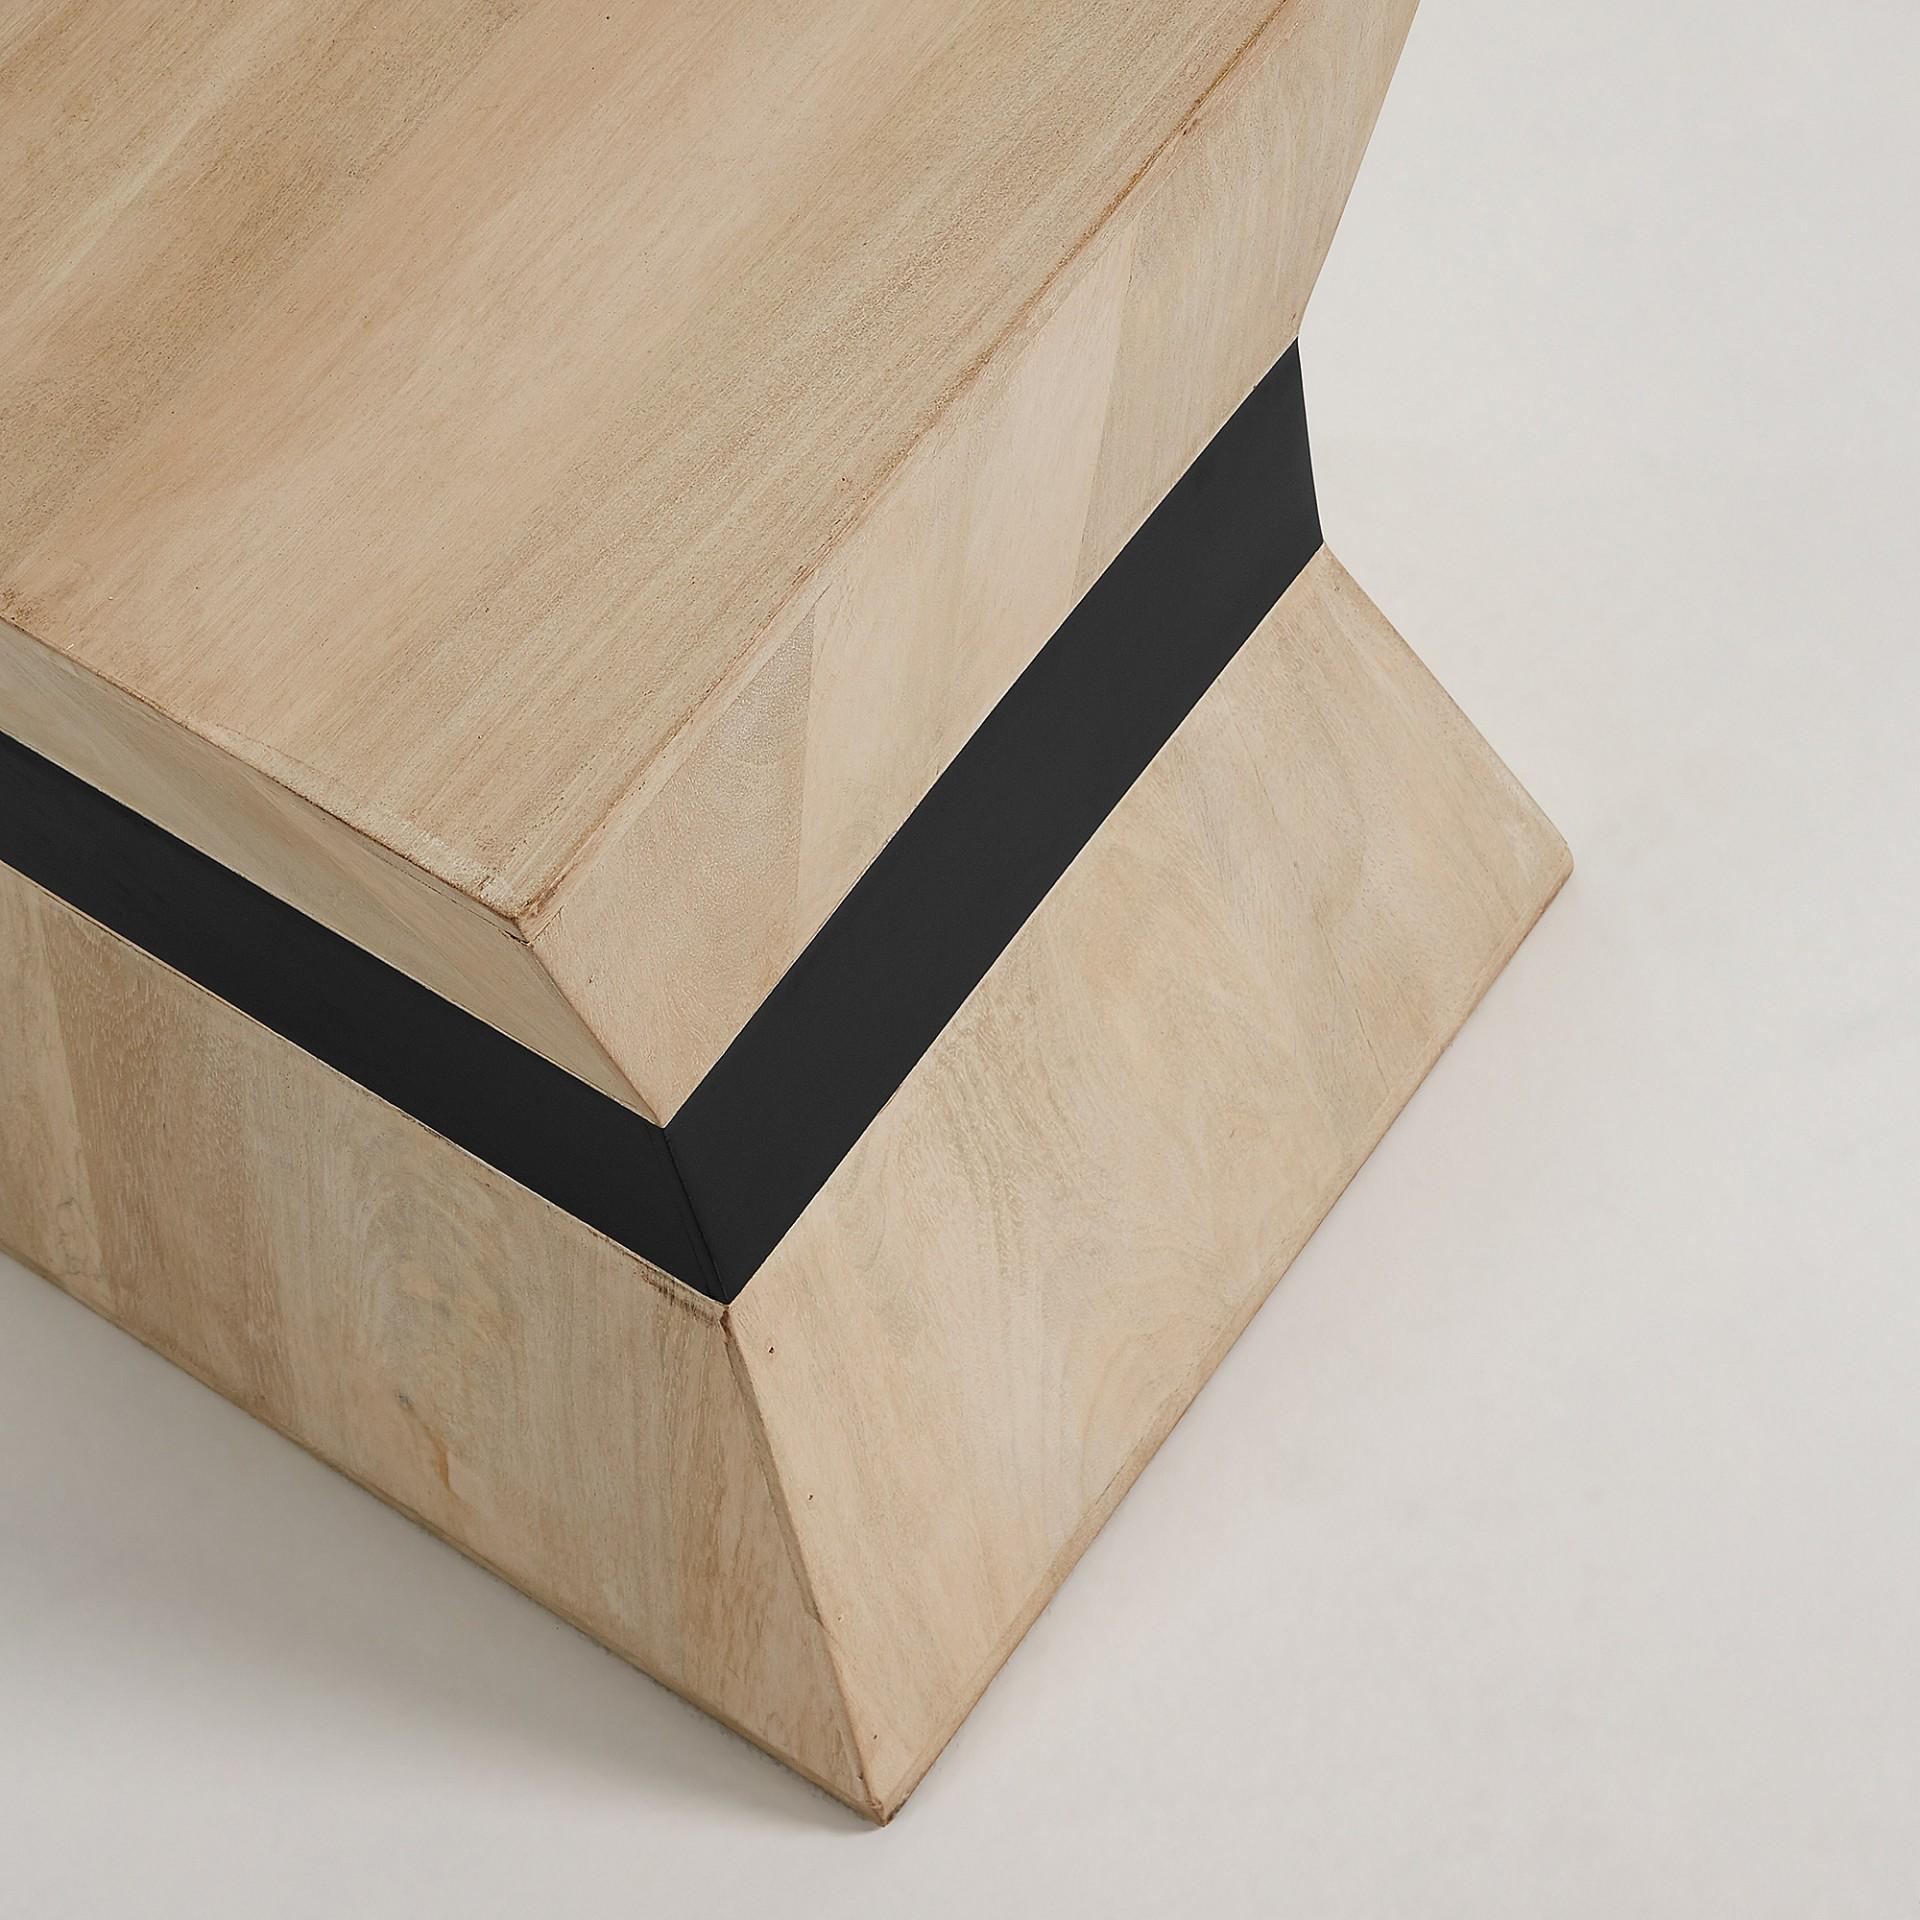 Mesa auxiliar Poke em madeira manga, 48,5x35 cm